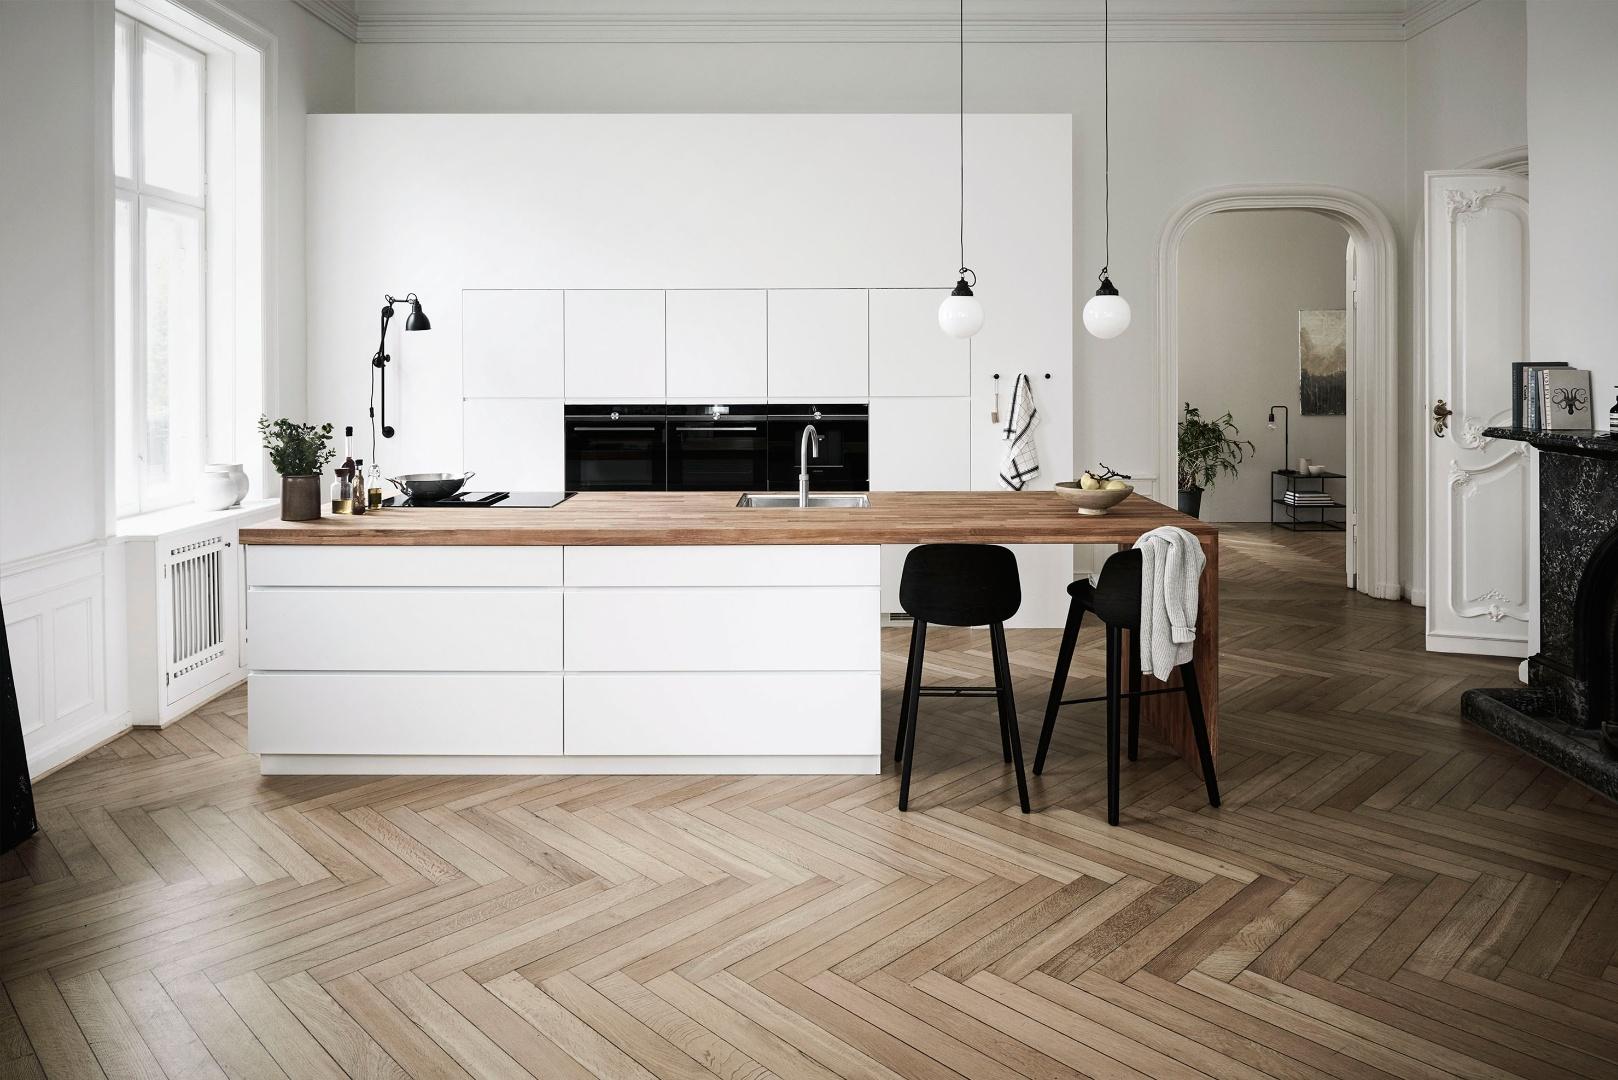 Kvik Mano Kitchen Design.jpg